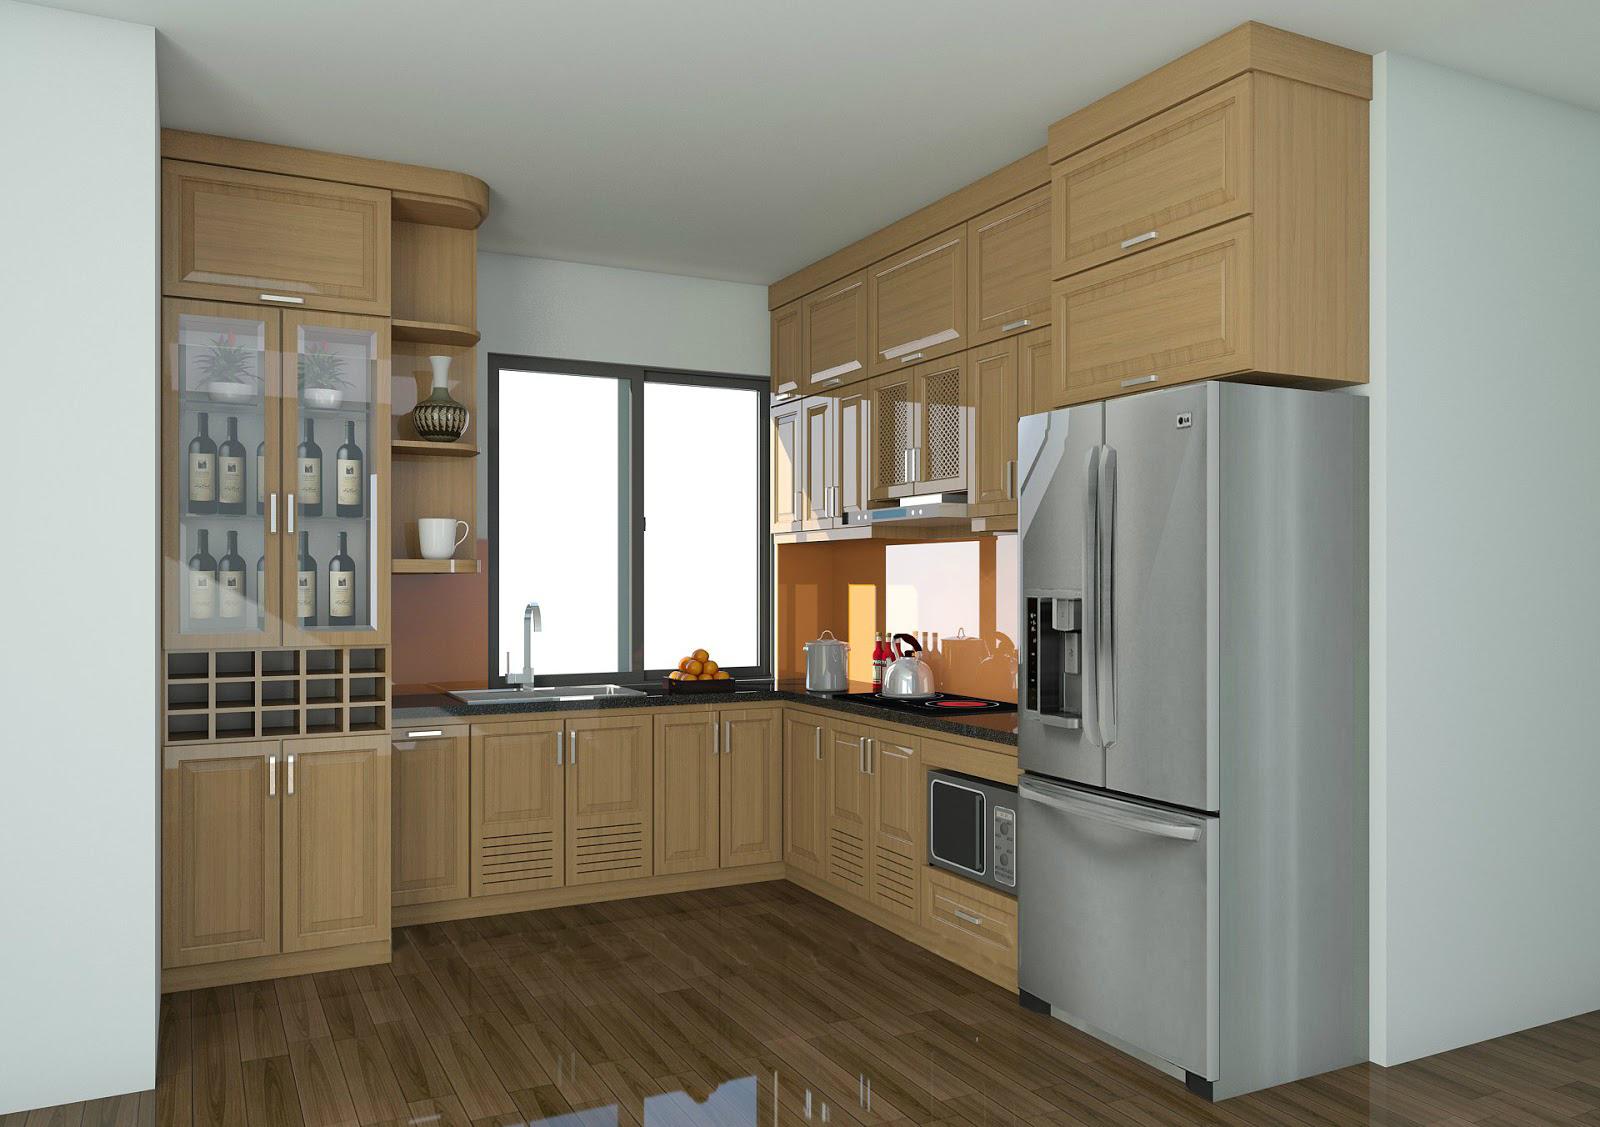 Tủ bếp gỗ sồi NHS-014